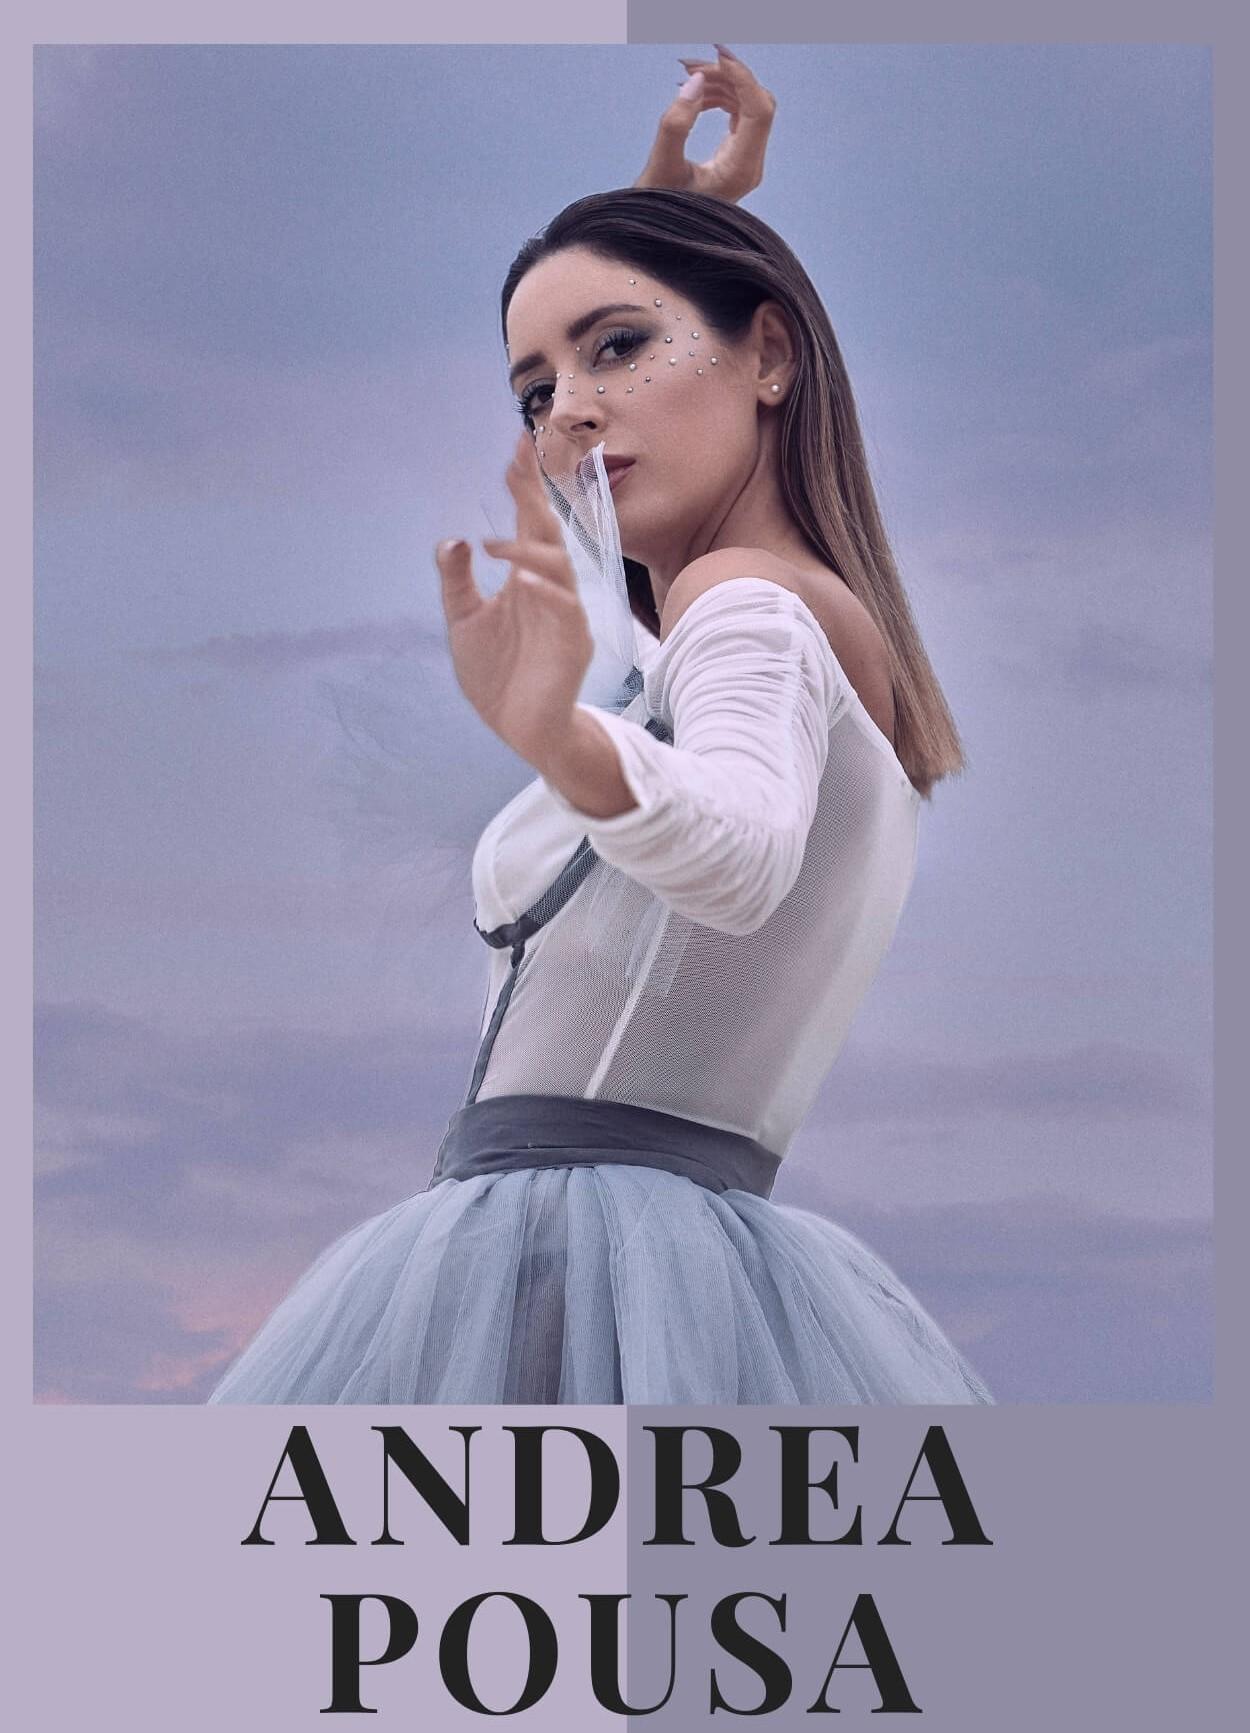 Andrea Pousa abrirá este ciclo provincial de música en galego o 9 de abril en Tui